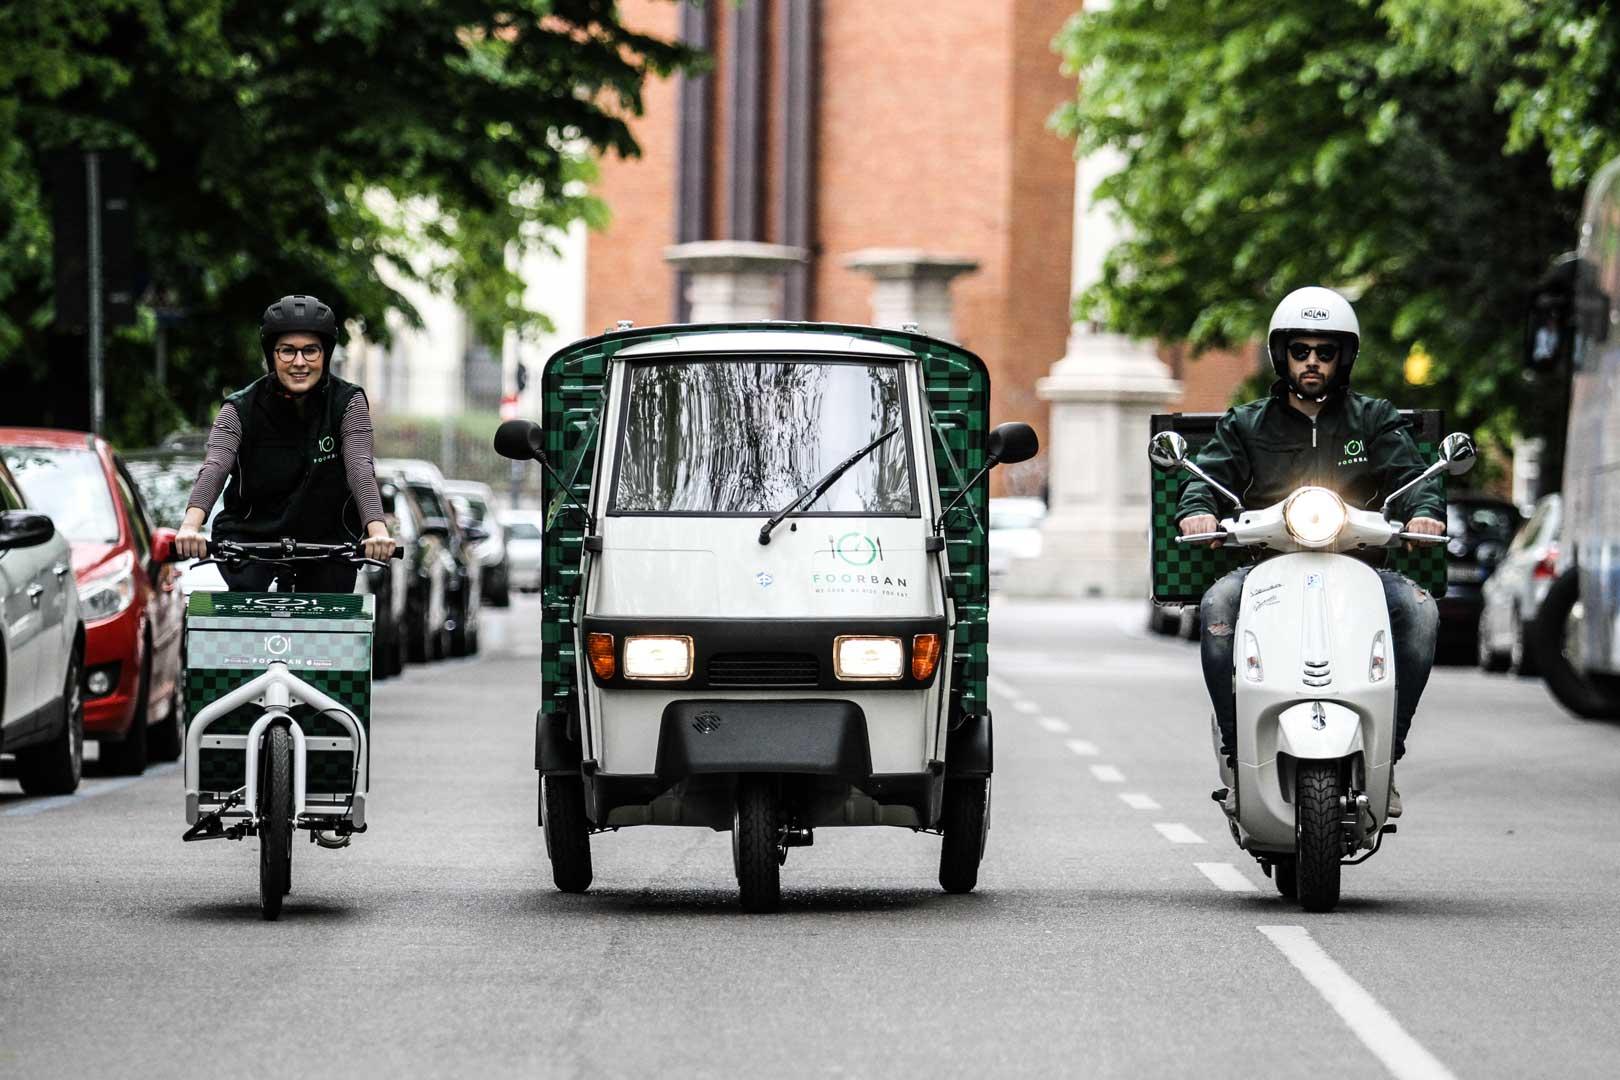 Healthy Food a Milano con Consegna a Domicilio